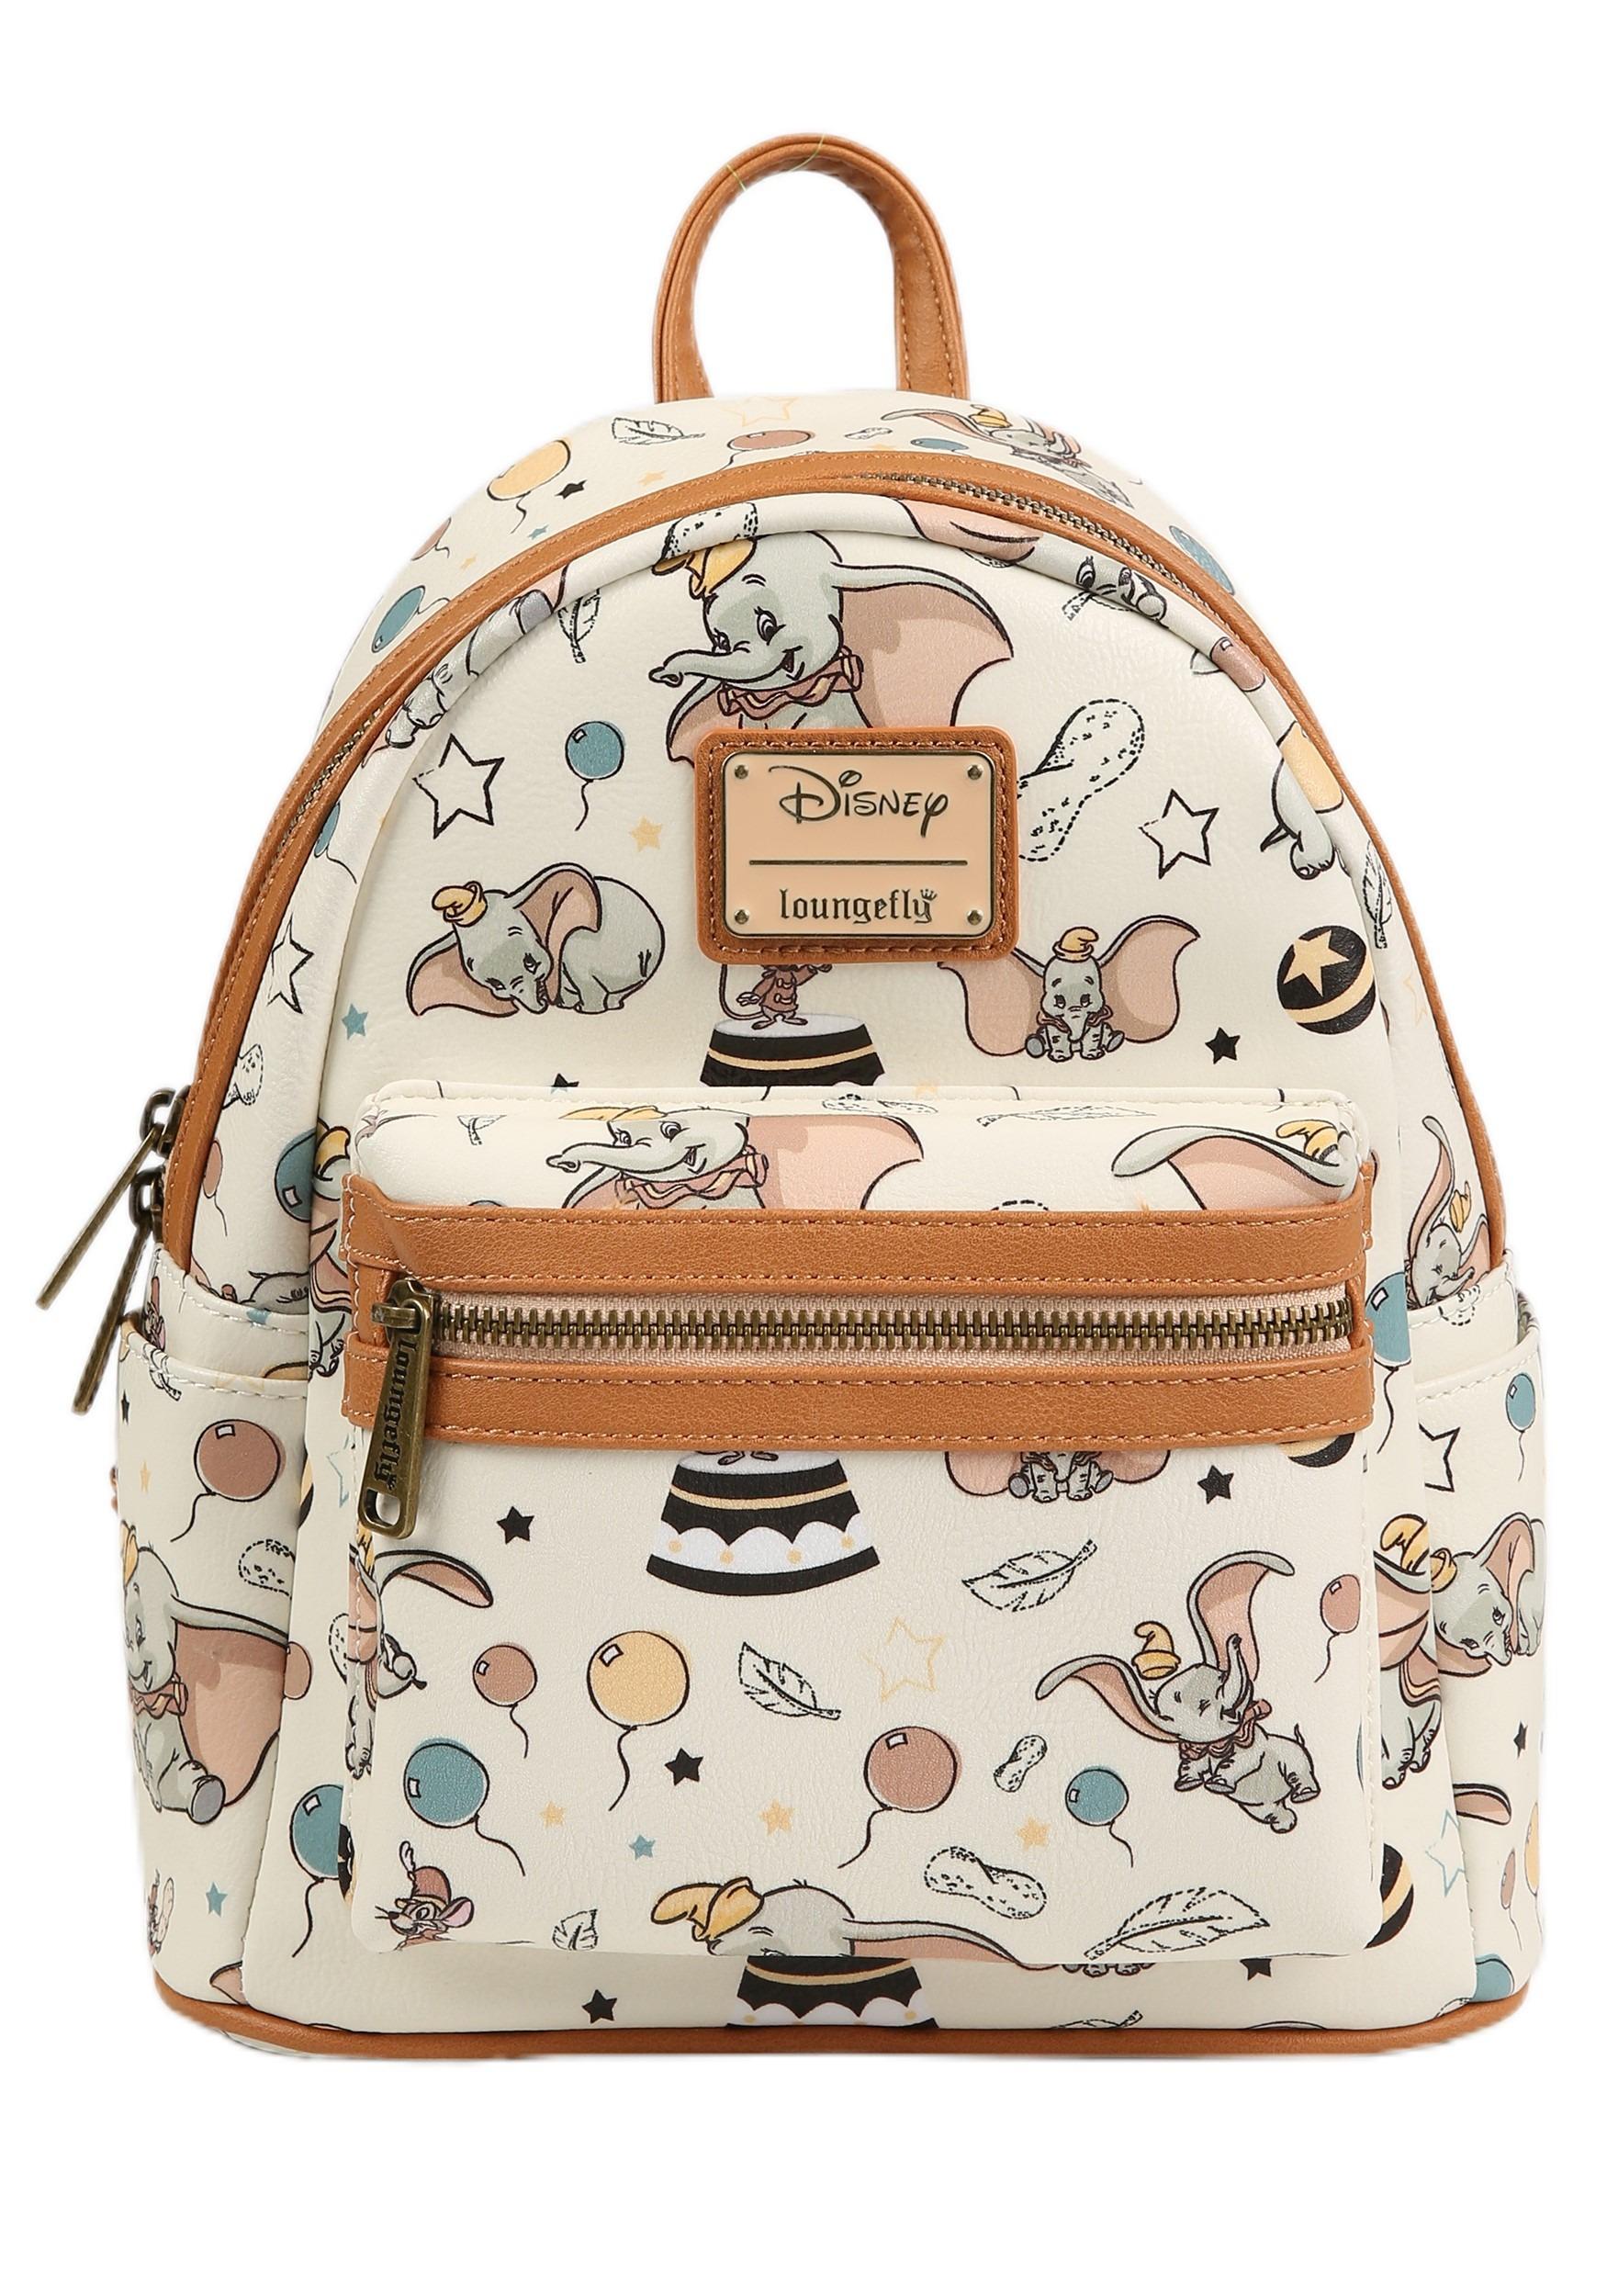 9de10738f1d Loungefly Disney s Dumbo Faux Leather Retro Print Mini Backpack